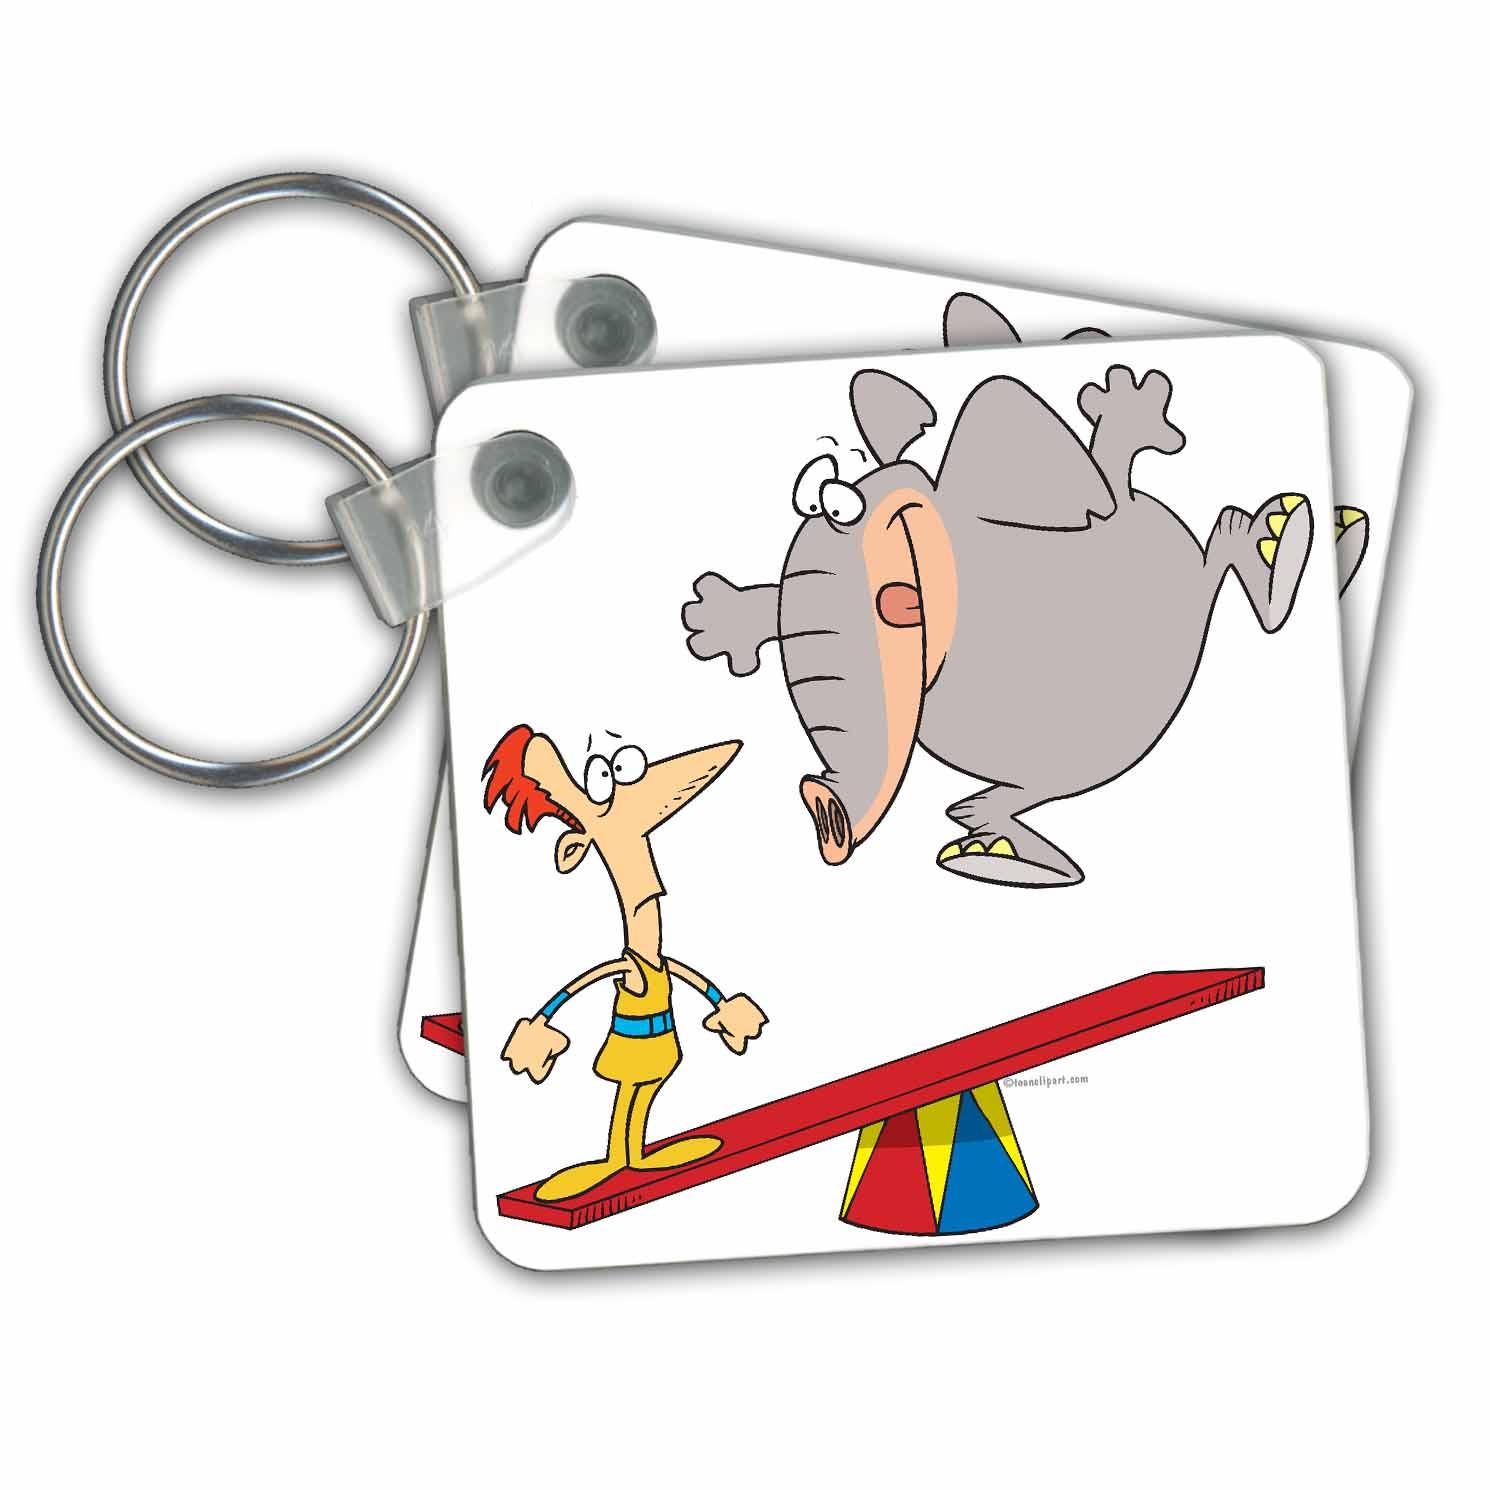 3dRose - Dooni Designs Random Toons - Elephant Teeter Totter Doom Cartoon - Key Chains at Sears.com